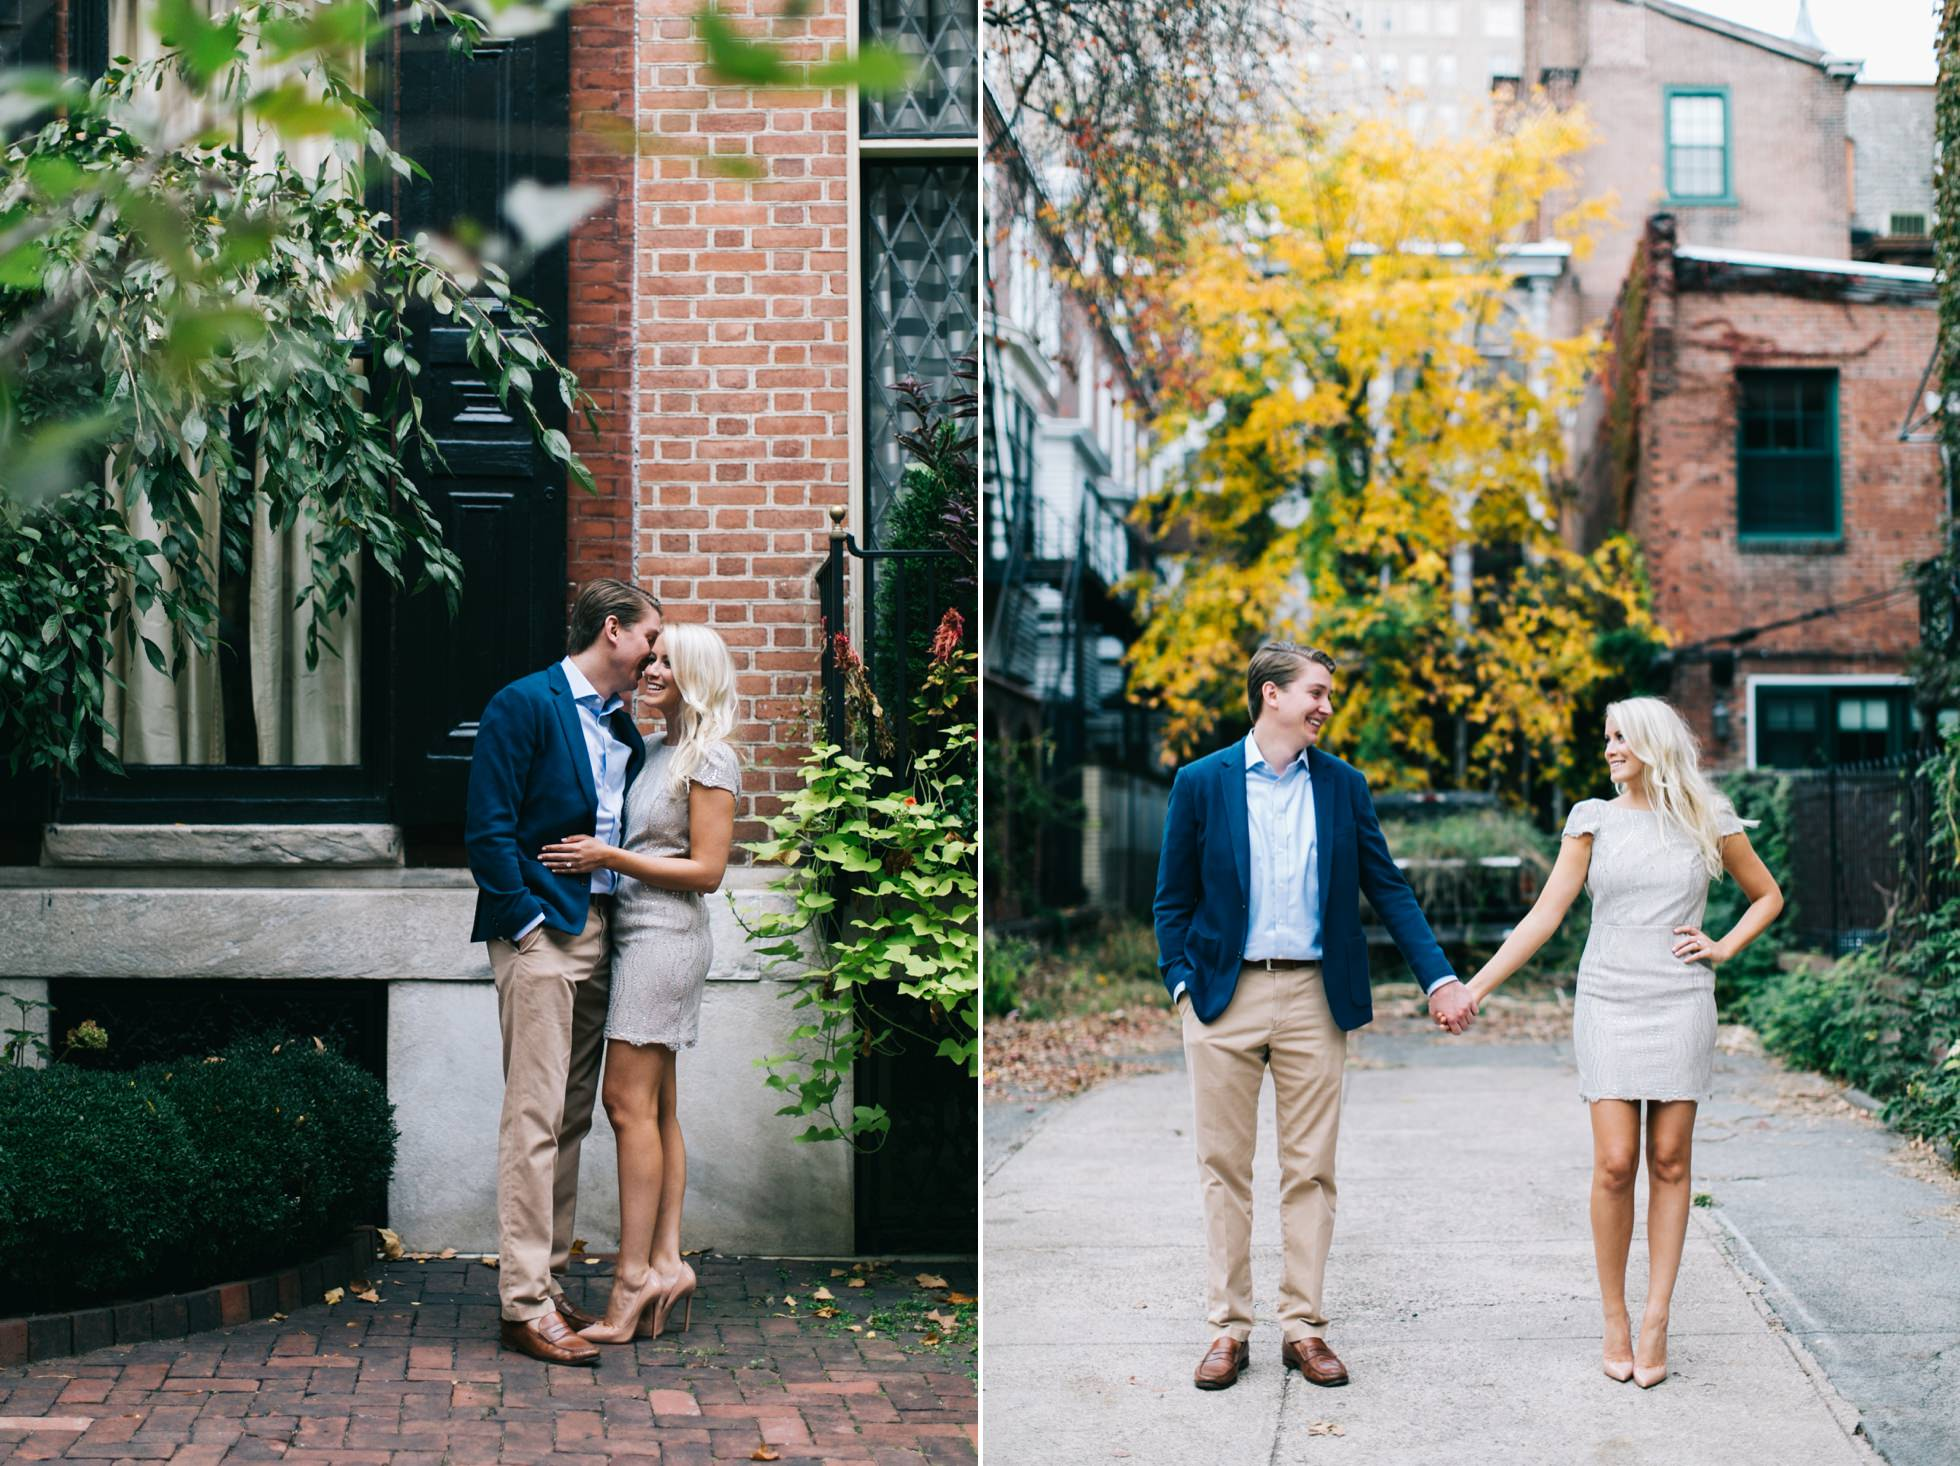 Jessica & Tim - Trendy Preppy Rittenhouse Parc Engagemenent 7